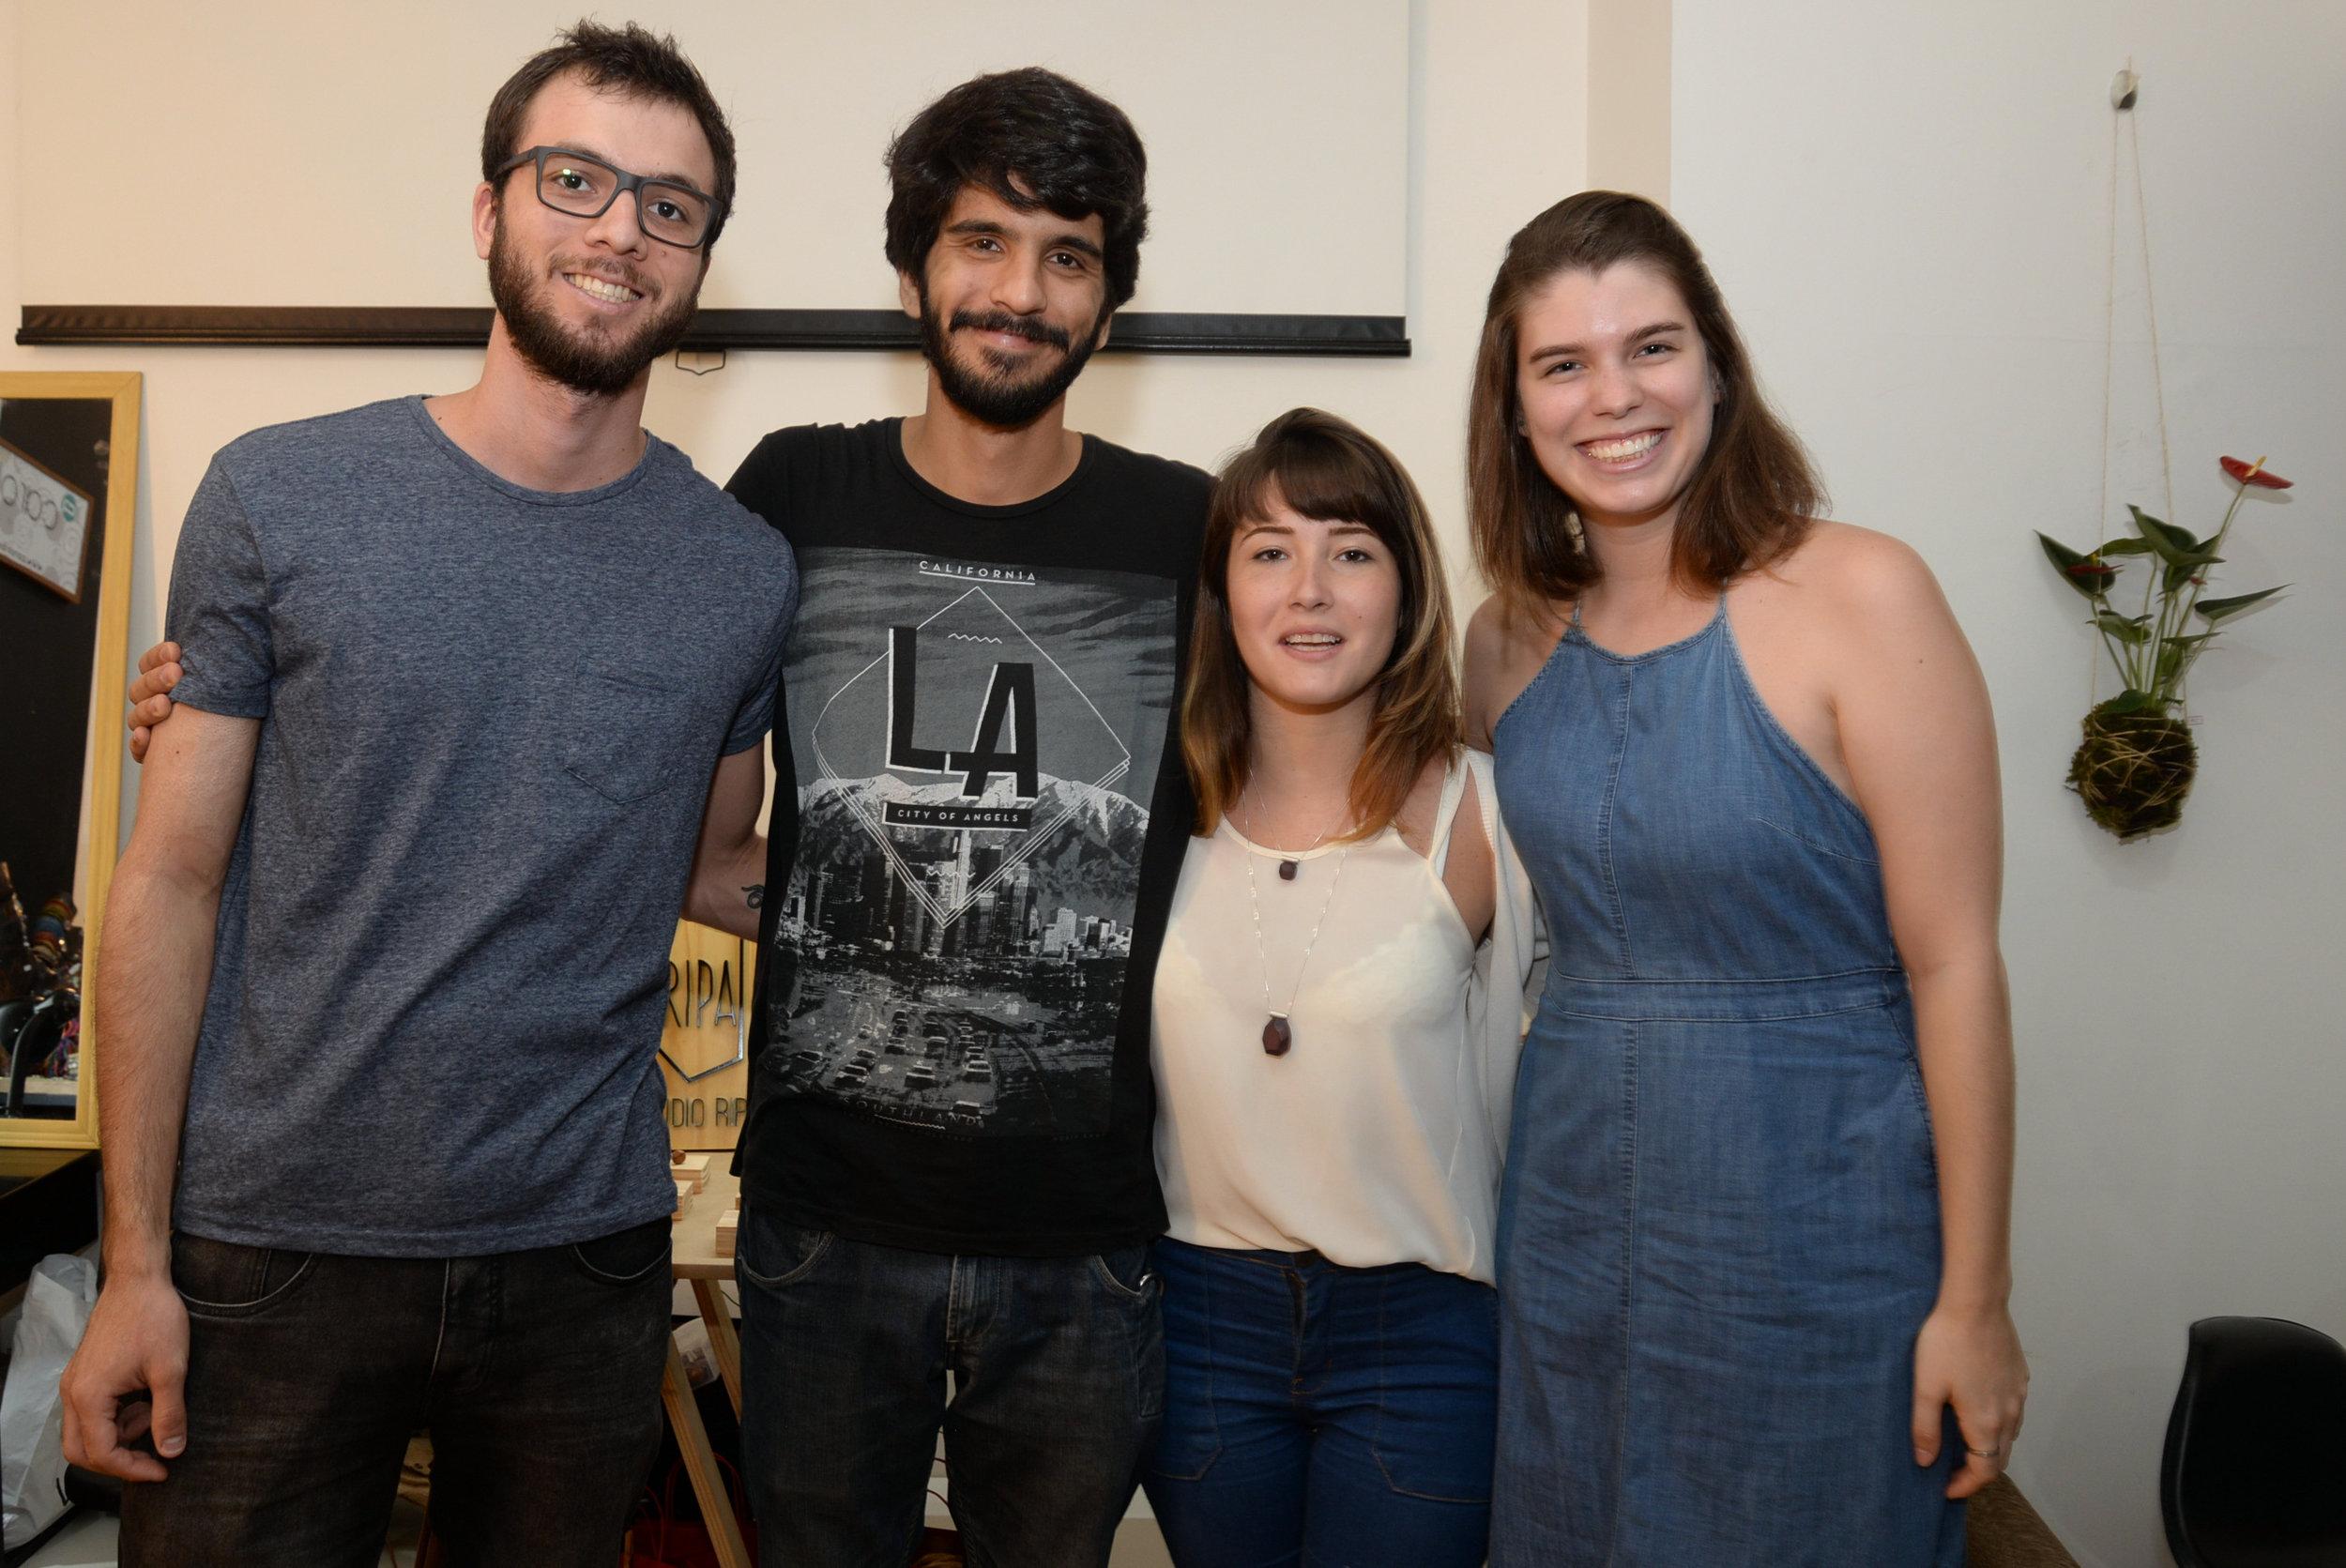 Leandro Oriente, Maire Ramazzina, Luiza Breier e Gabriela Real.JPG